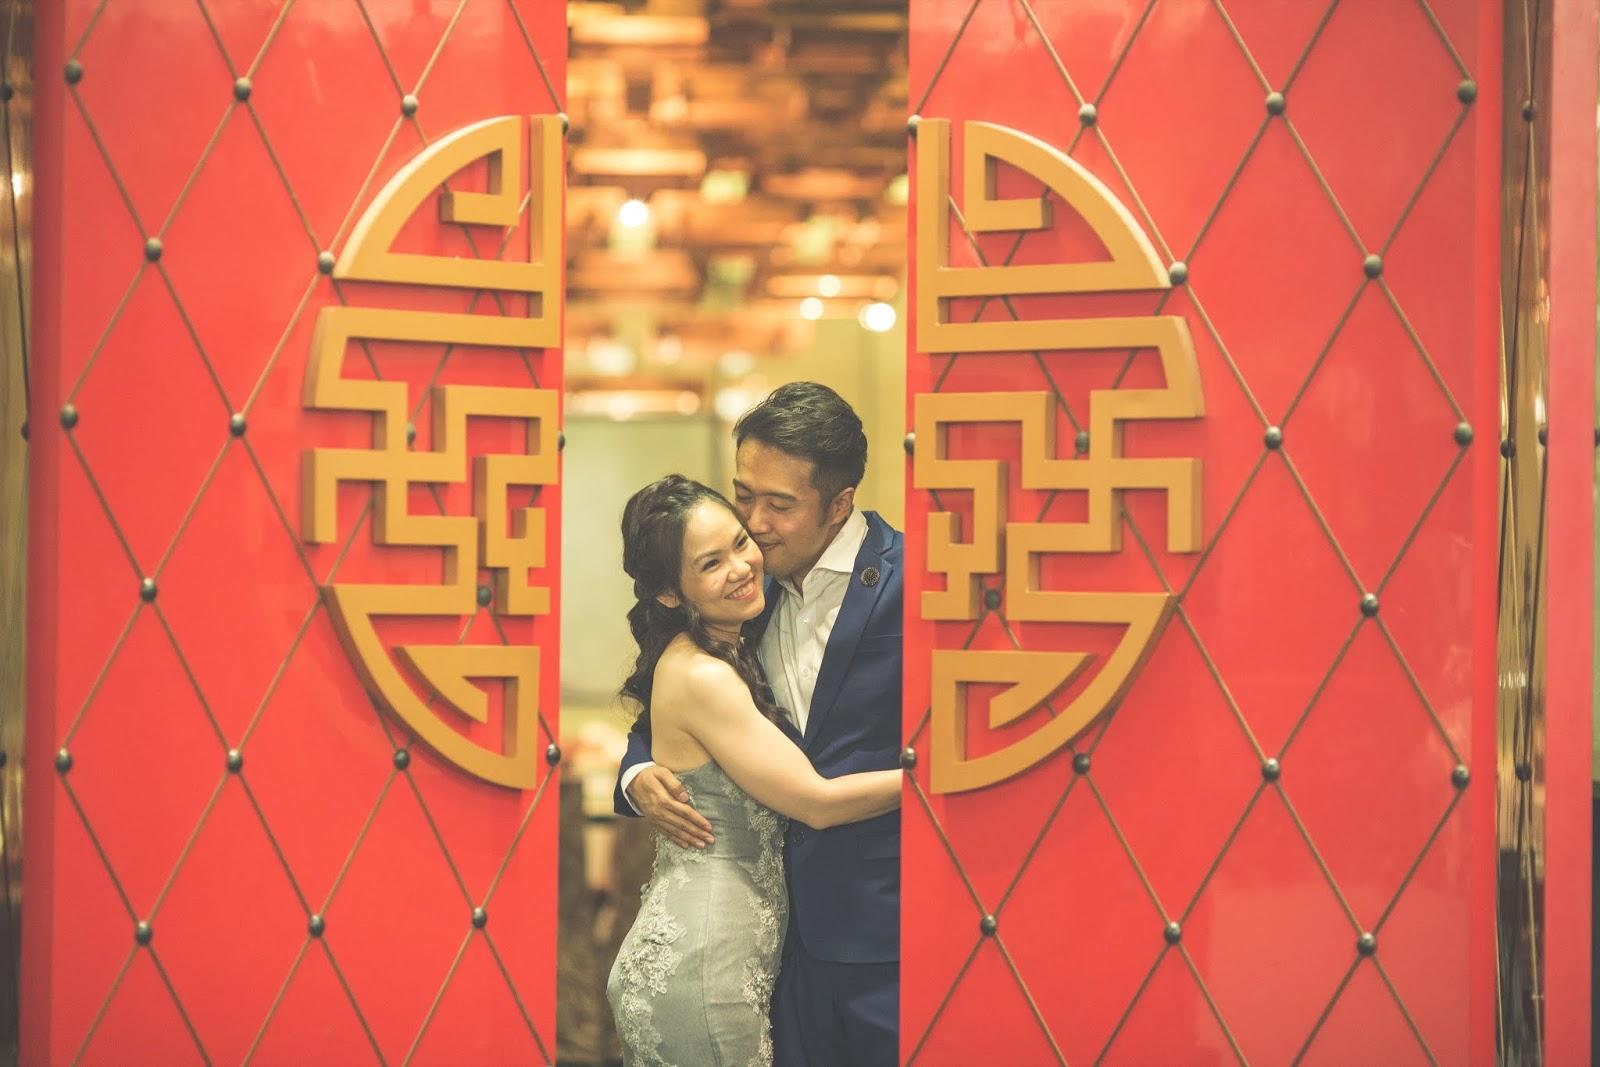 Wedding photographer penang butterworth